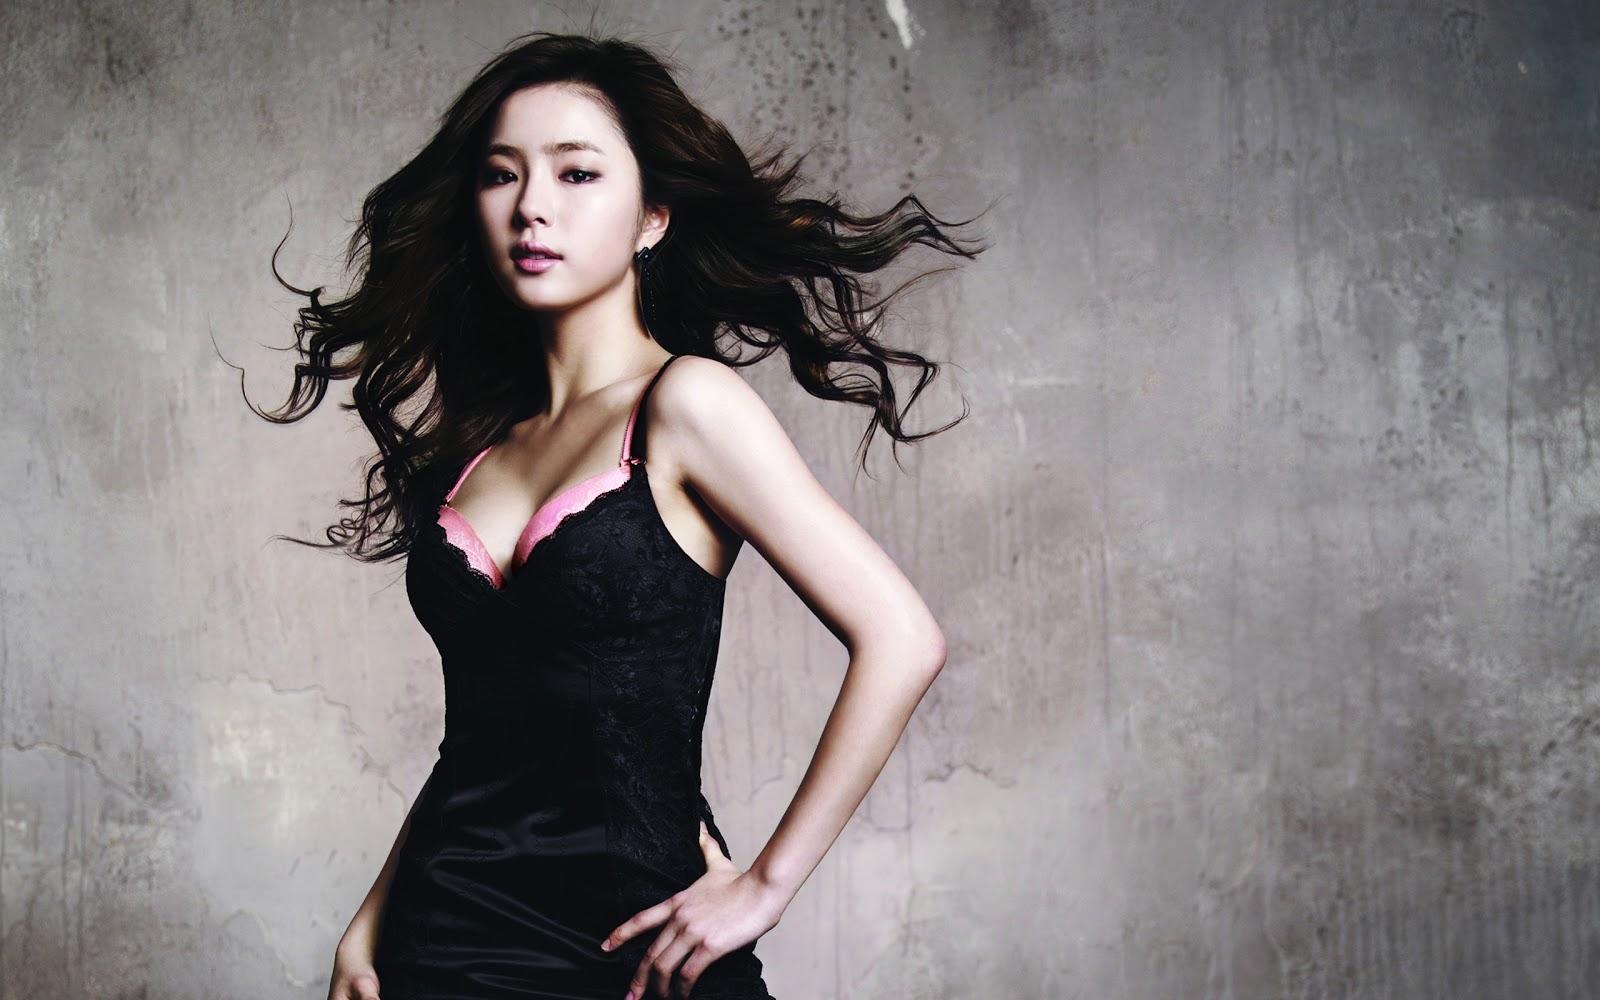 Shin Se Kyung Hot Wallpaper HD | Beautiful Song Lyrics